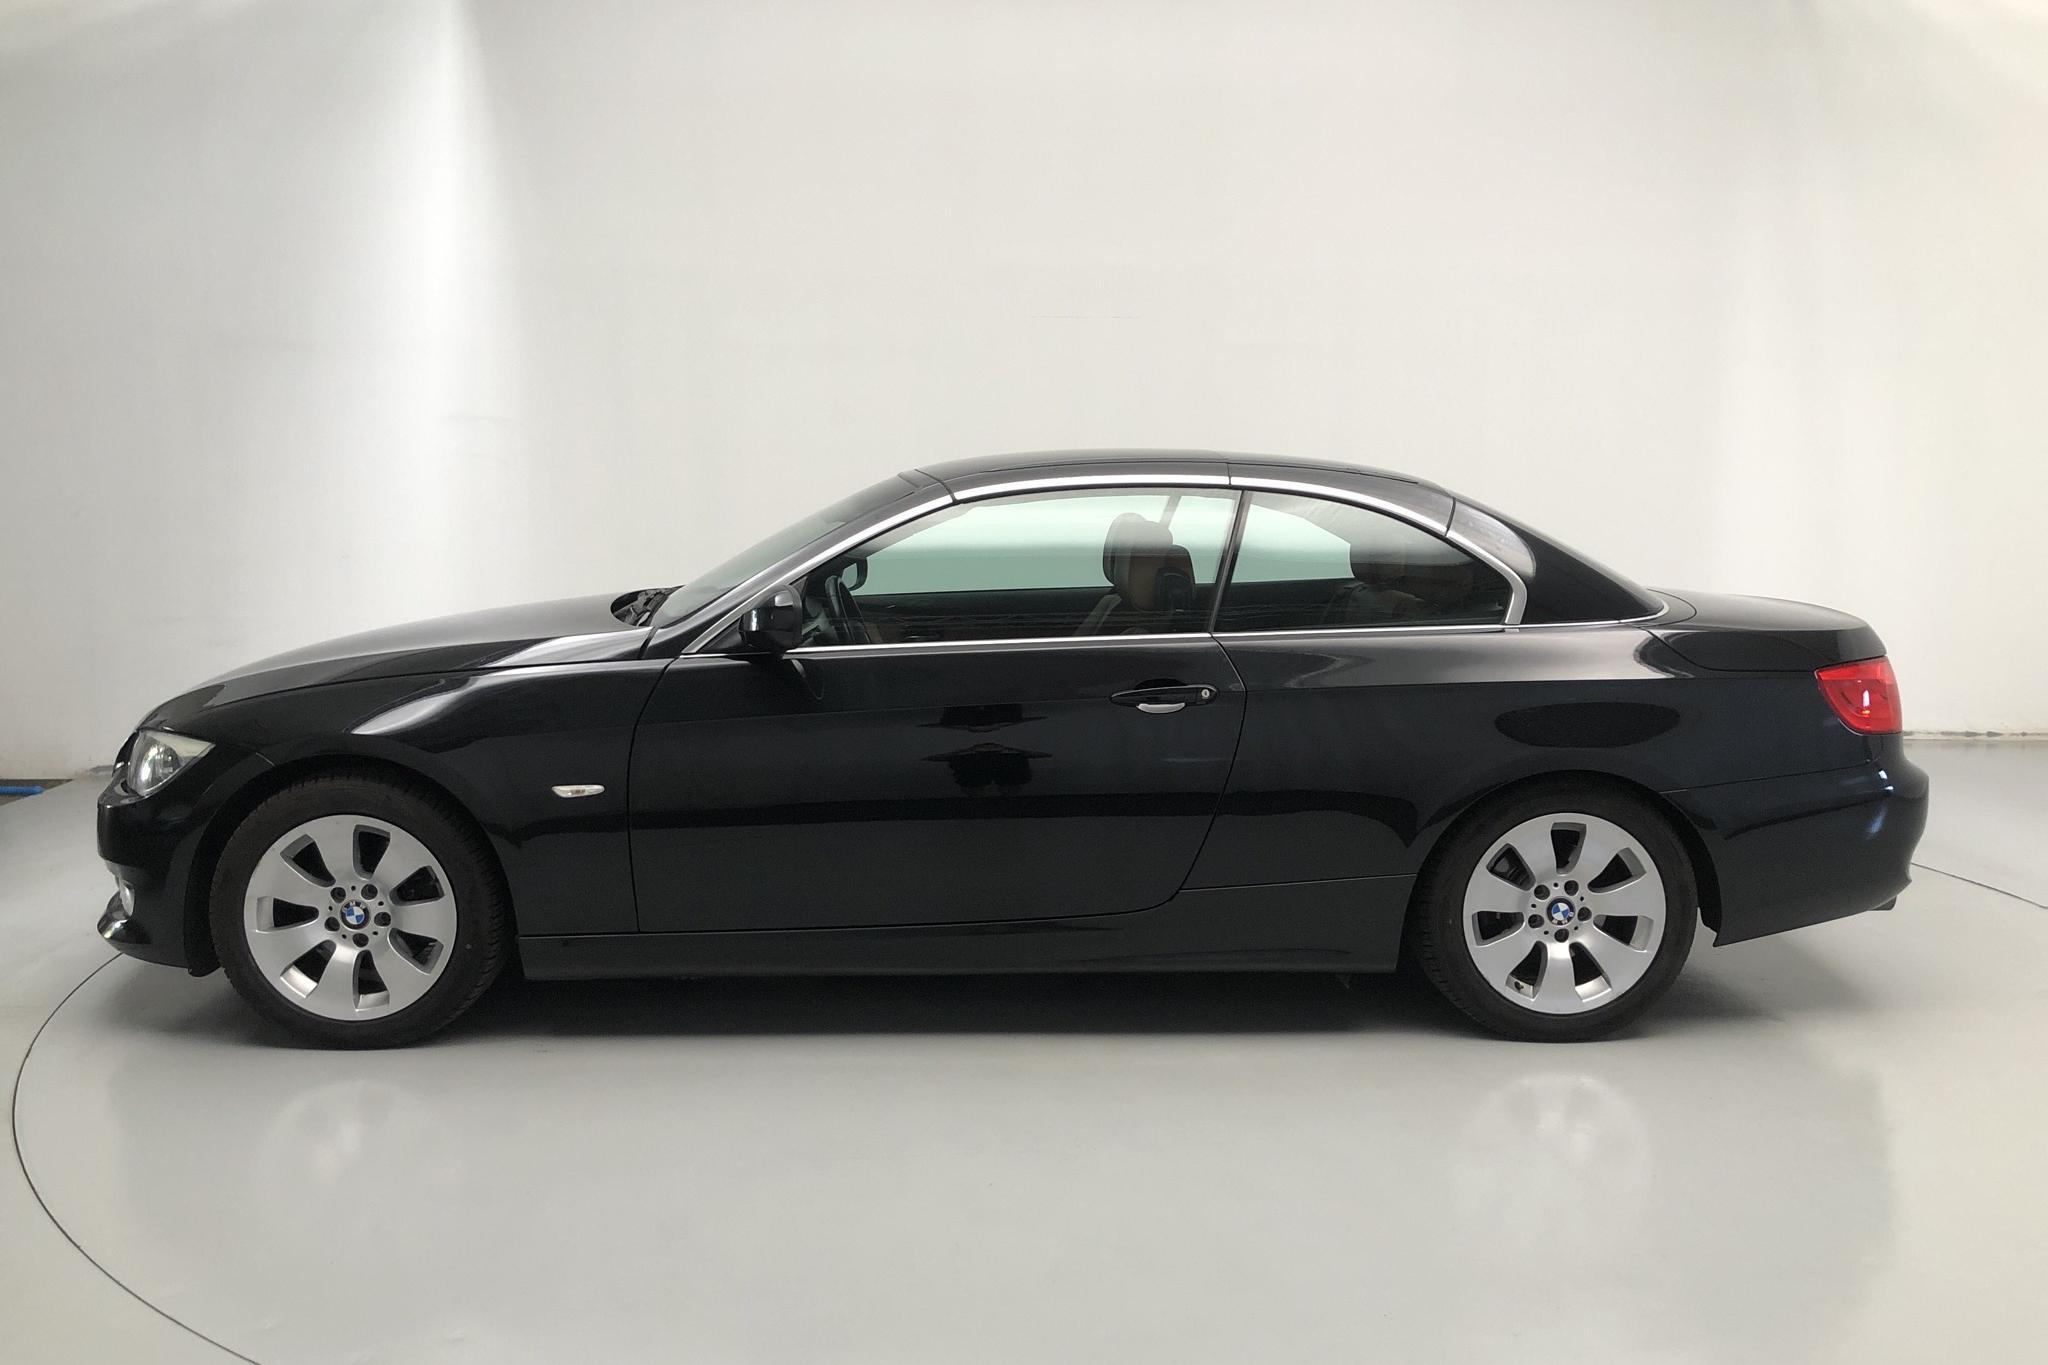 BMW 320d Cabriolet, E93 (184hk) - 100 230 km - Manual - black - 2012